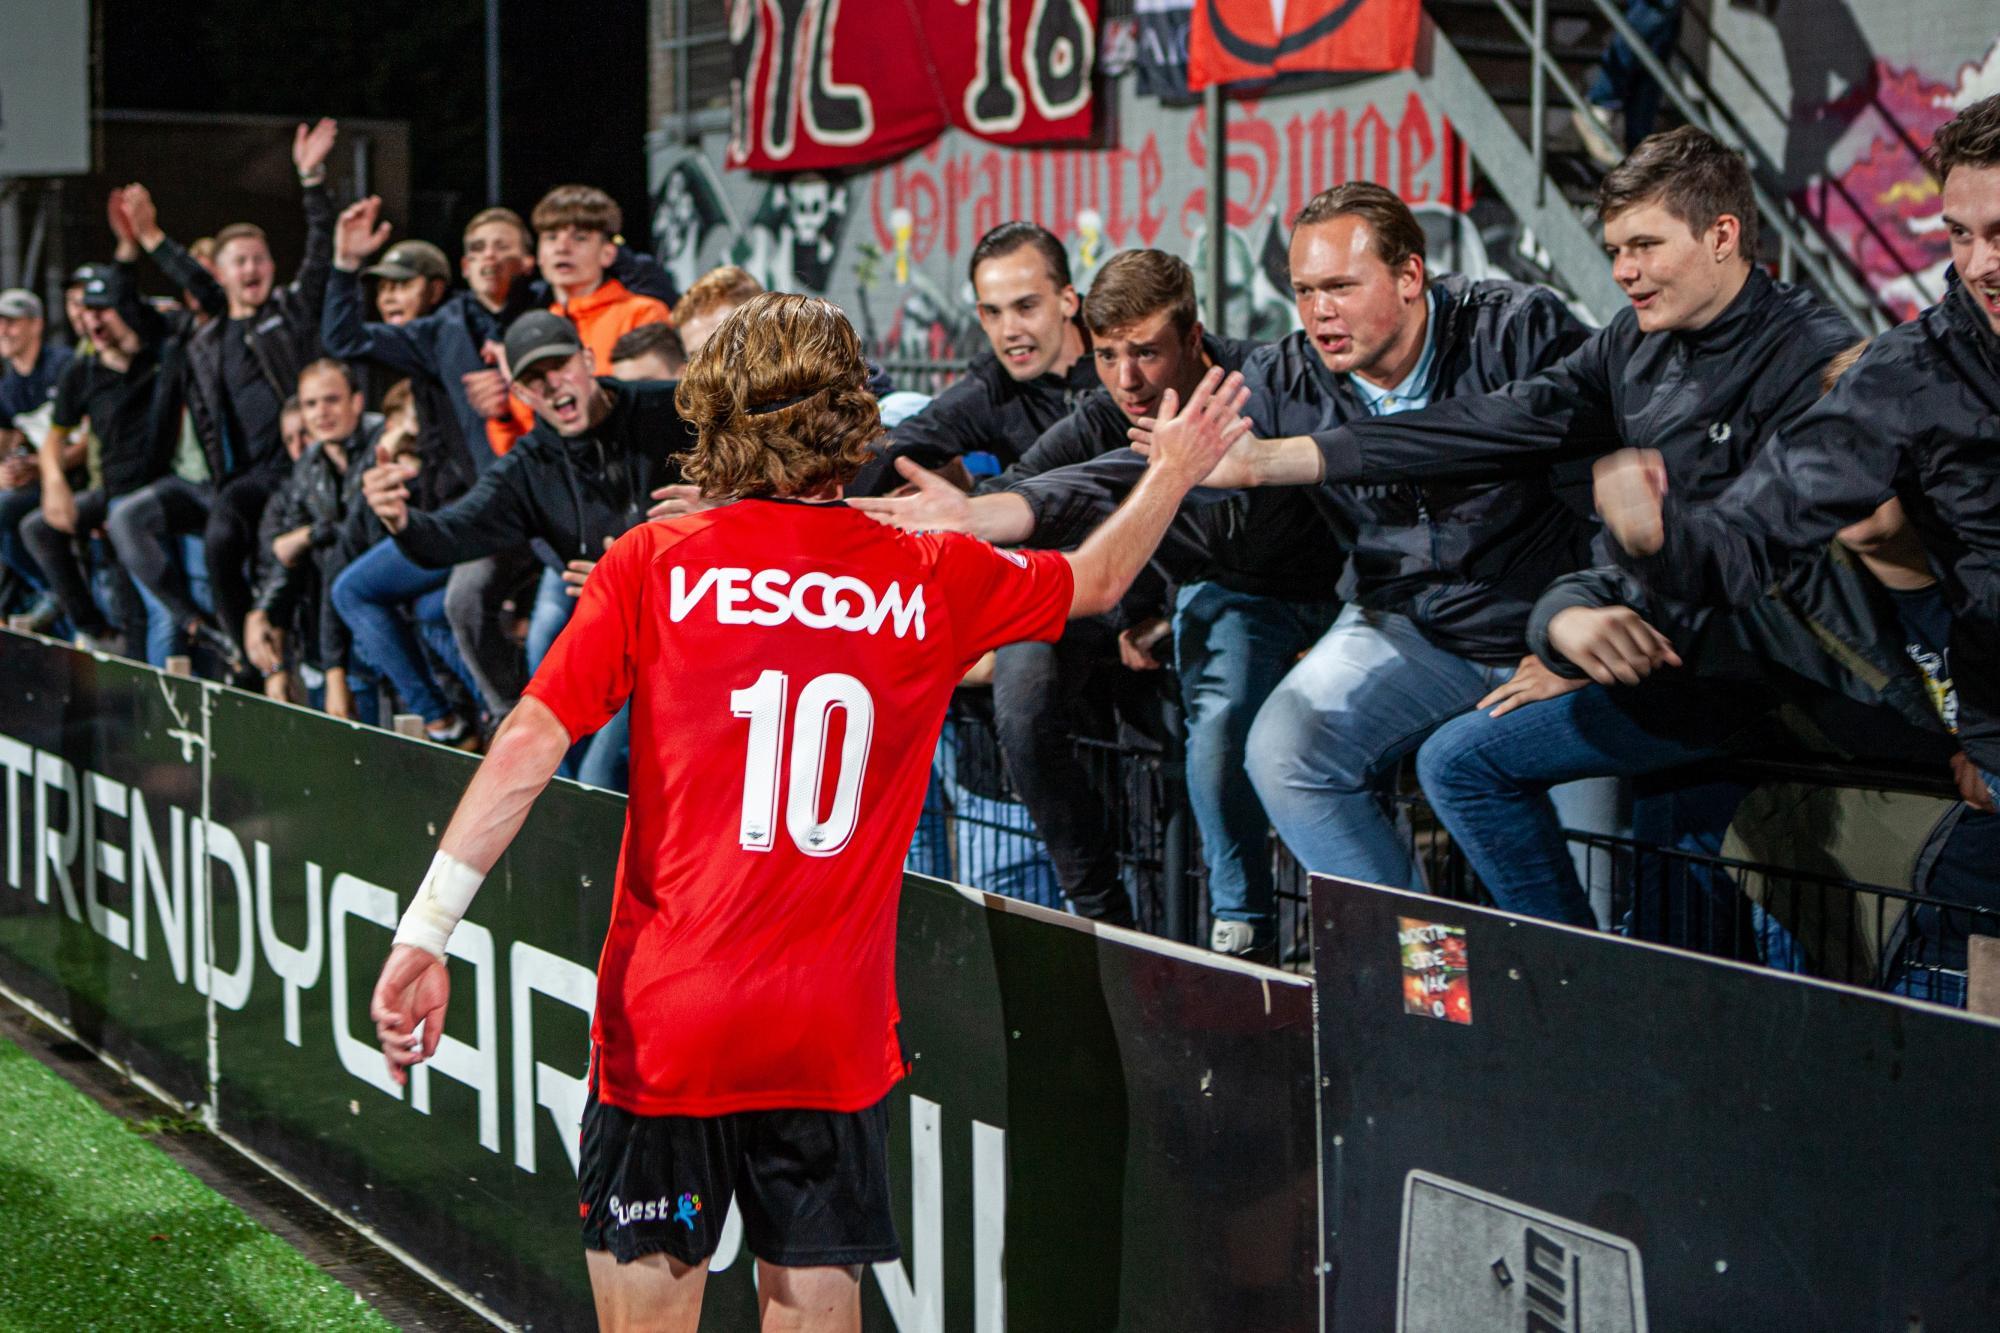 PSV_VanKeilegom.jpg